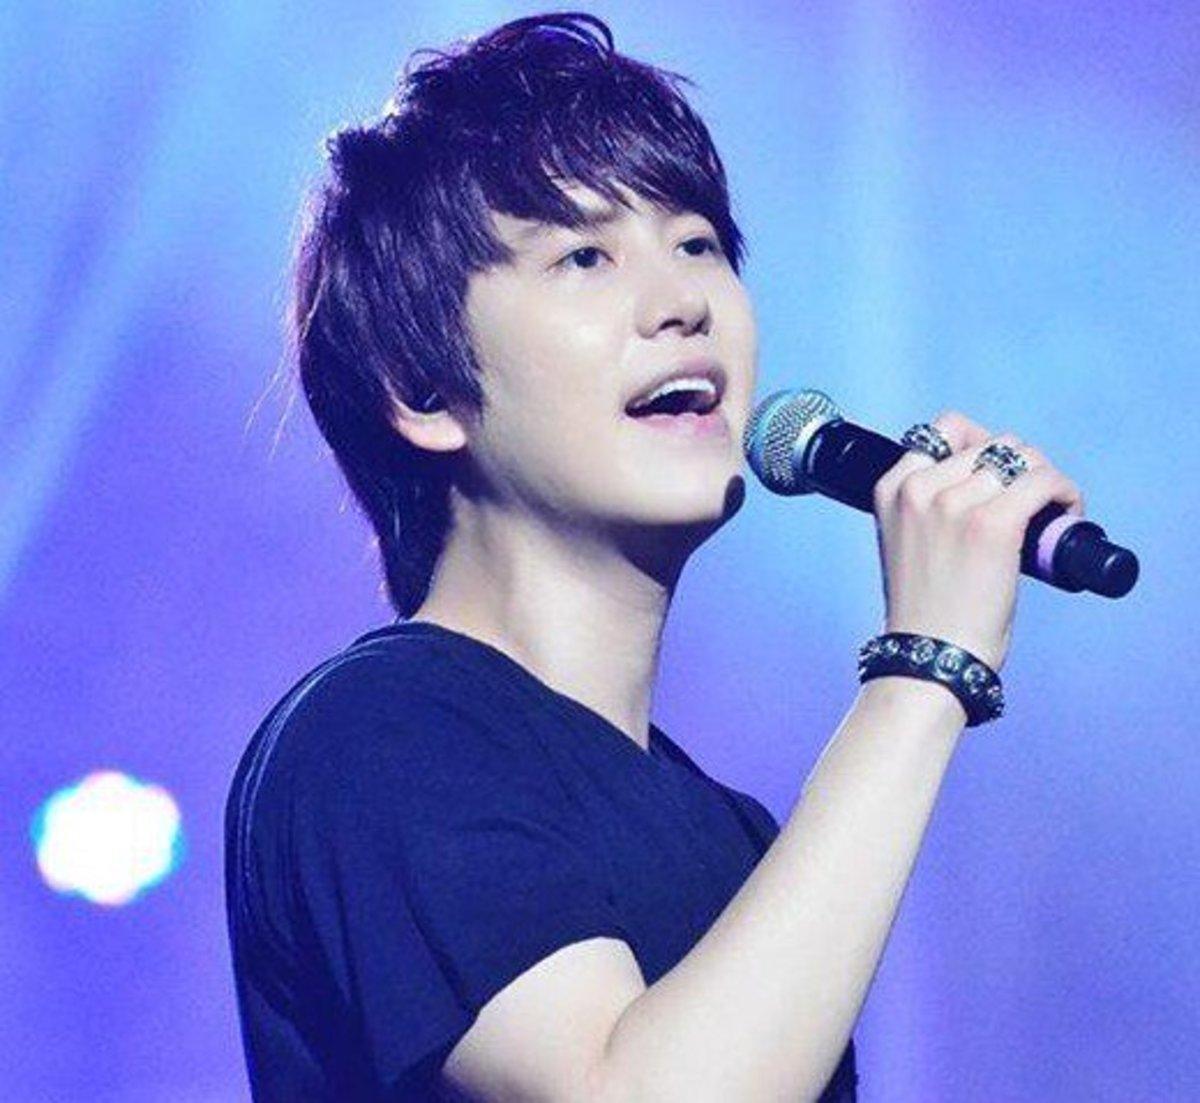 Top 10 Best K-Pop Male Vocalists